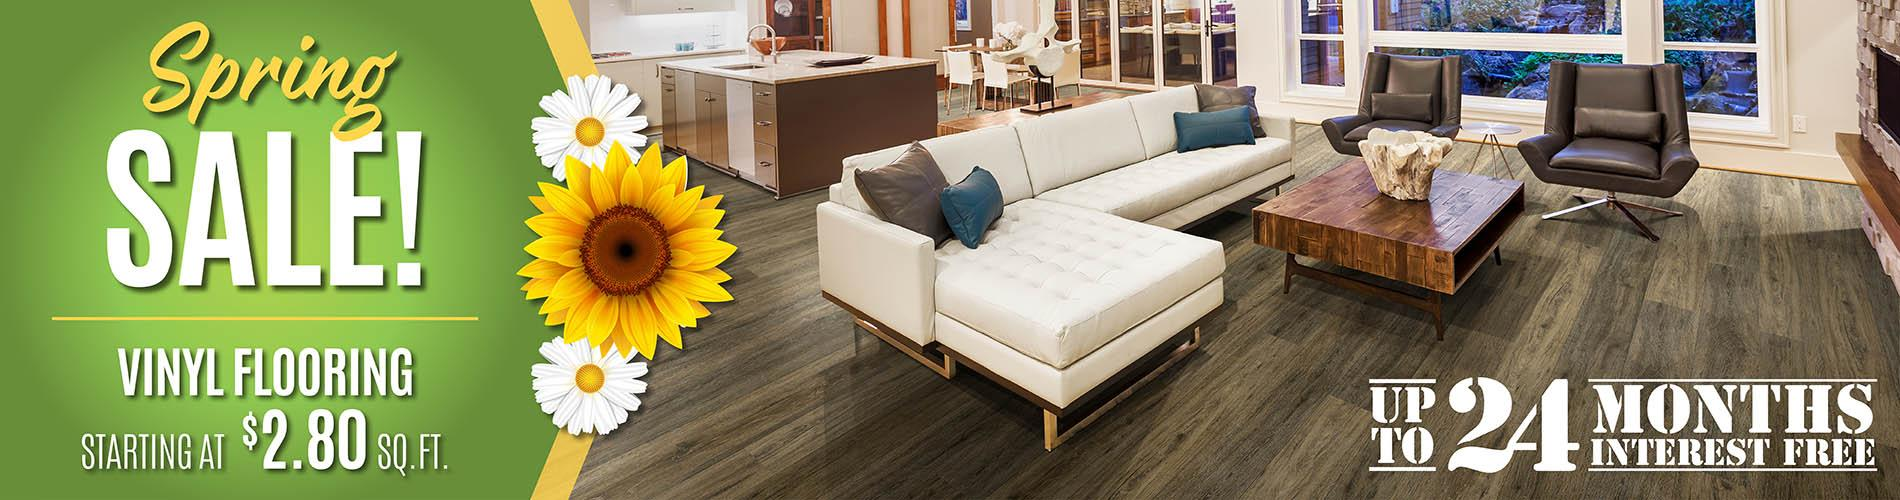 Spring Sale! Vinyl flooring starting at $2.80 sq. ft.